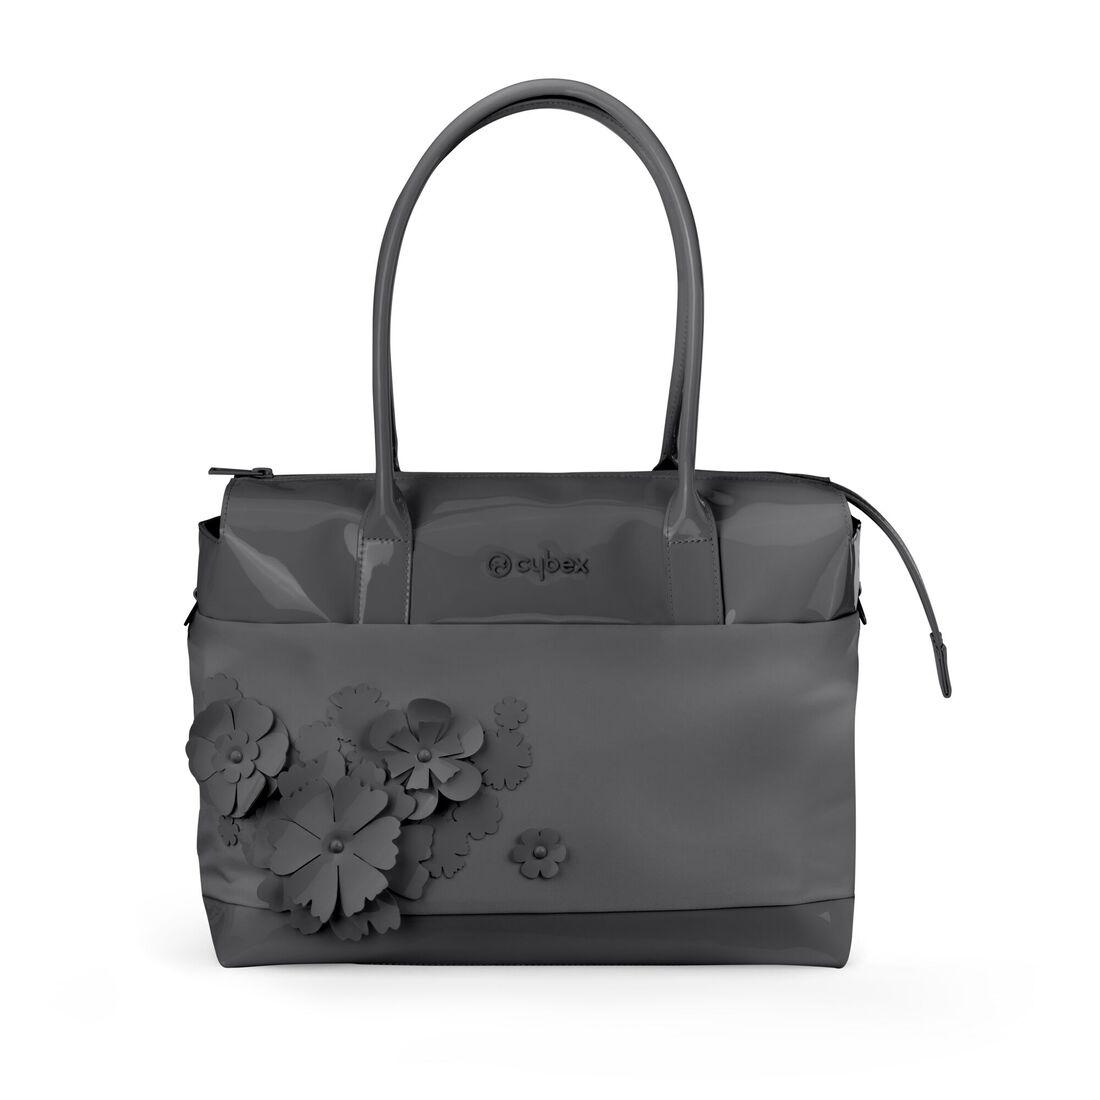 CYBEX Wickeltasche Simply Flowers - Grey in Dream Grey large Bild 1